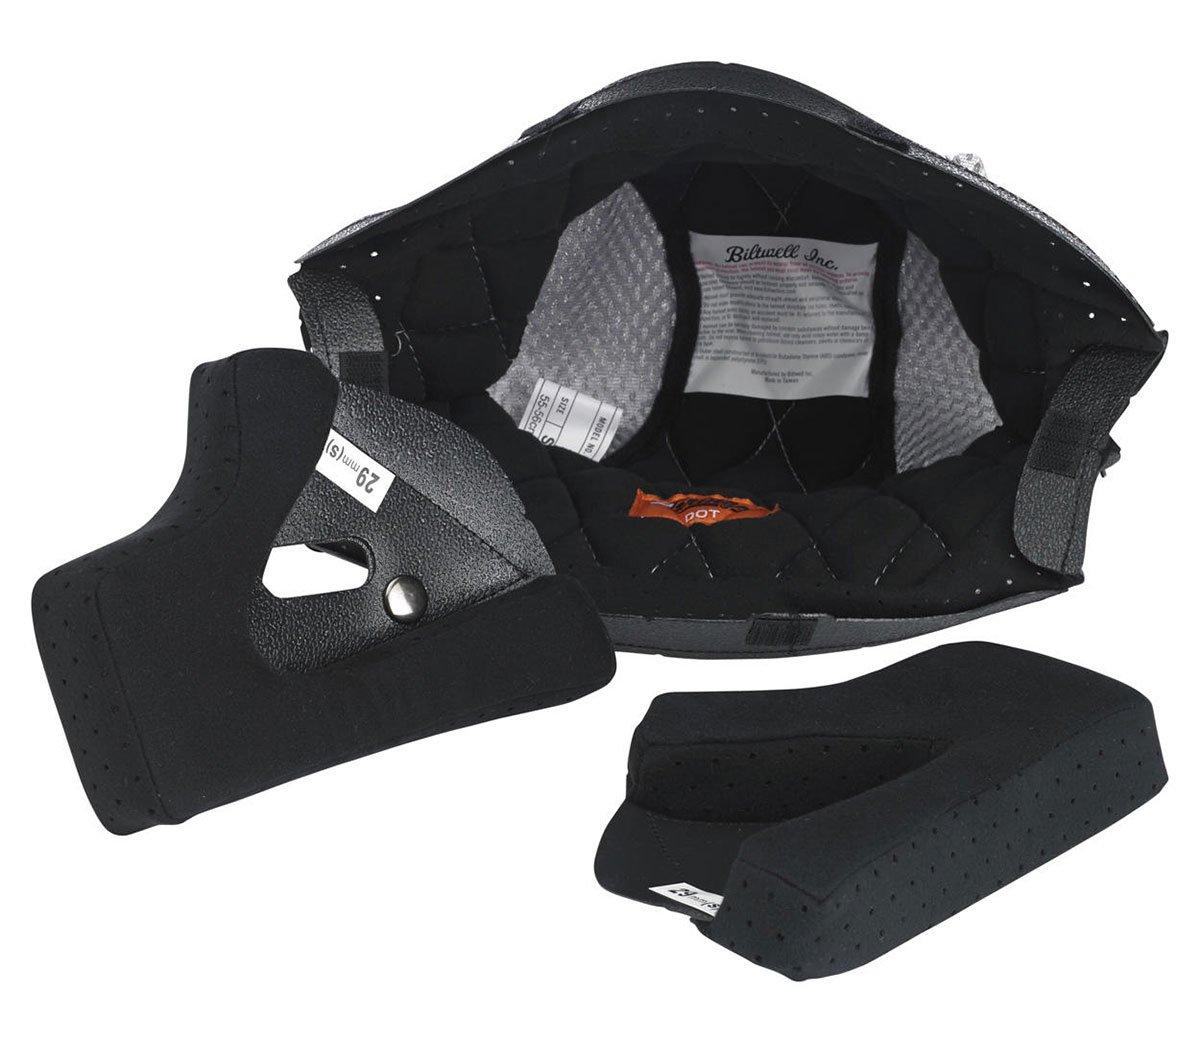 Biltwell - Gringo / Gringo S Helmet Liner - Black / Silver - Medium